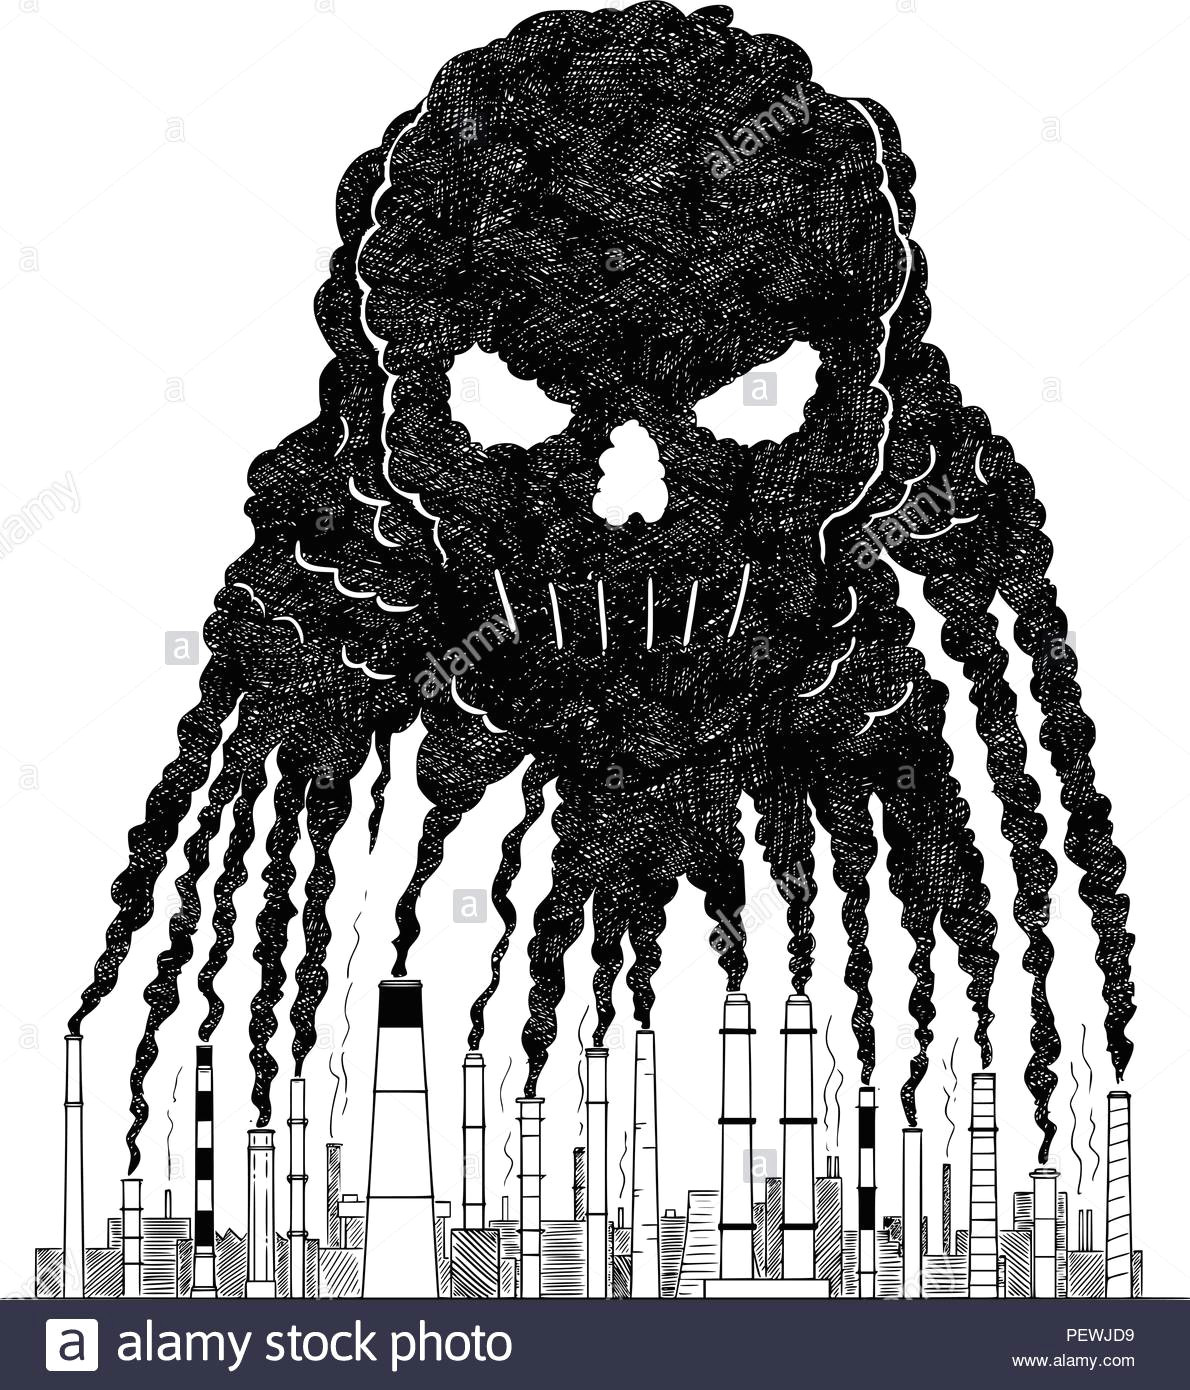 vector artistic drawing illustration of smoke from smokestacks creating human skull concept of toxic air pollution